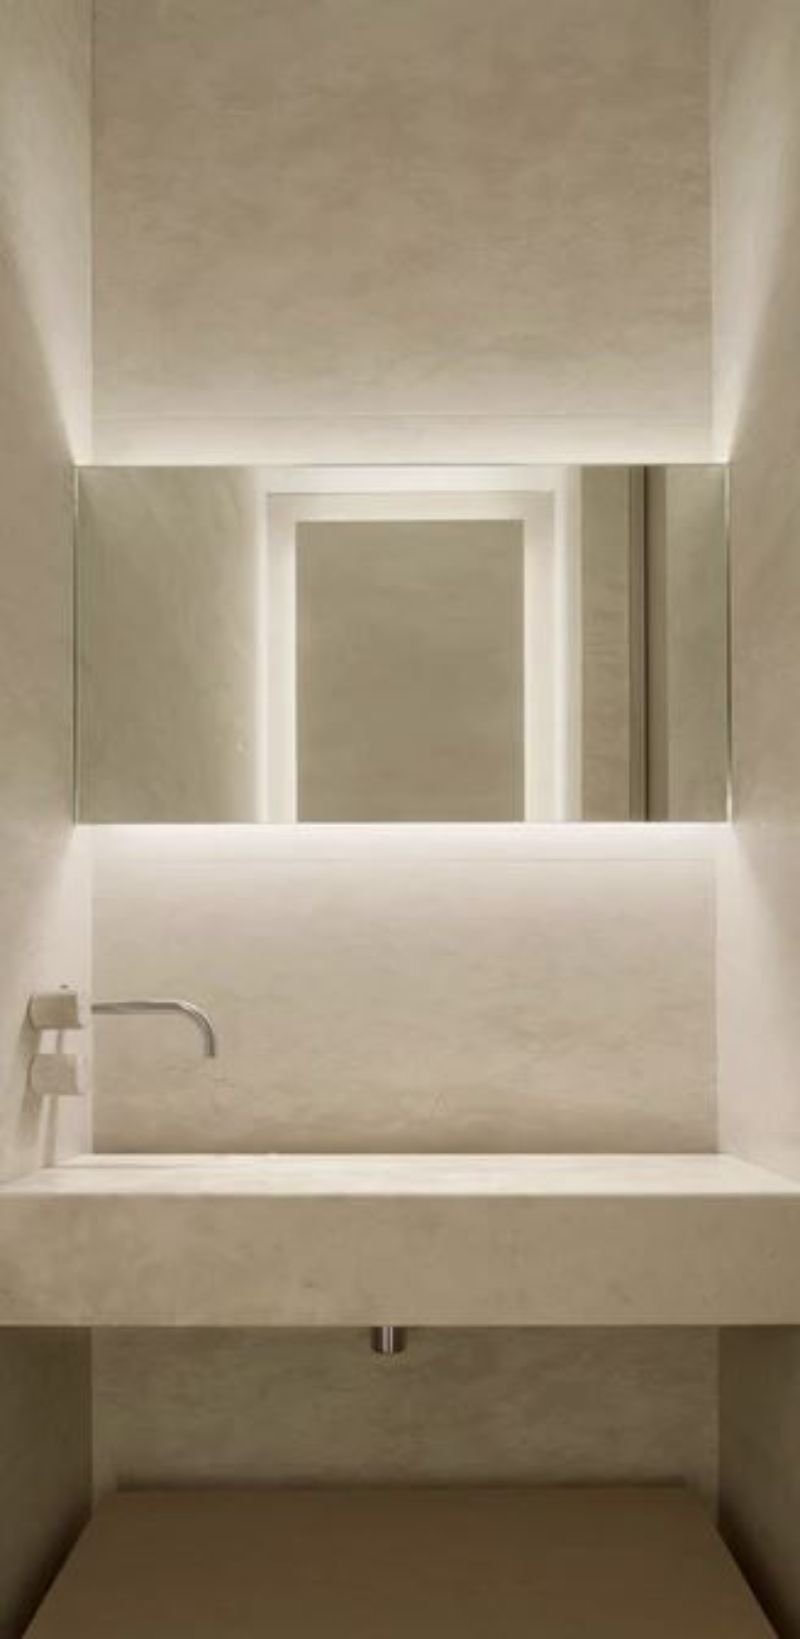 Top Interior Designers in London top interior designers in london Top Interior Designers in London to Create the Perfect Bathroom Anouska Hempel Design